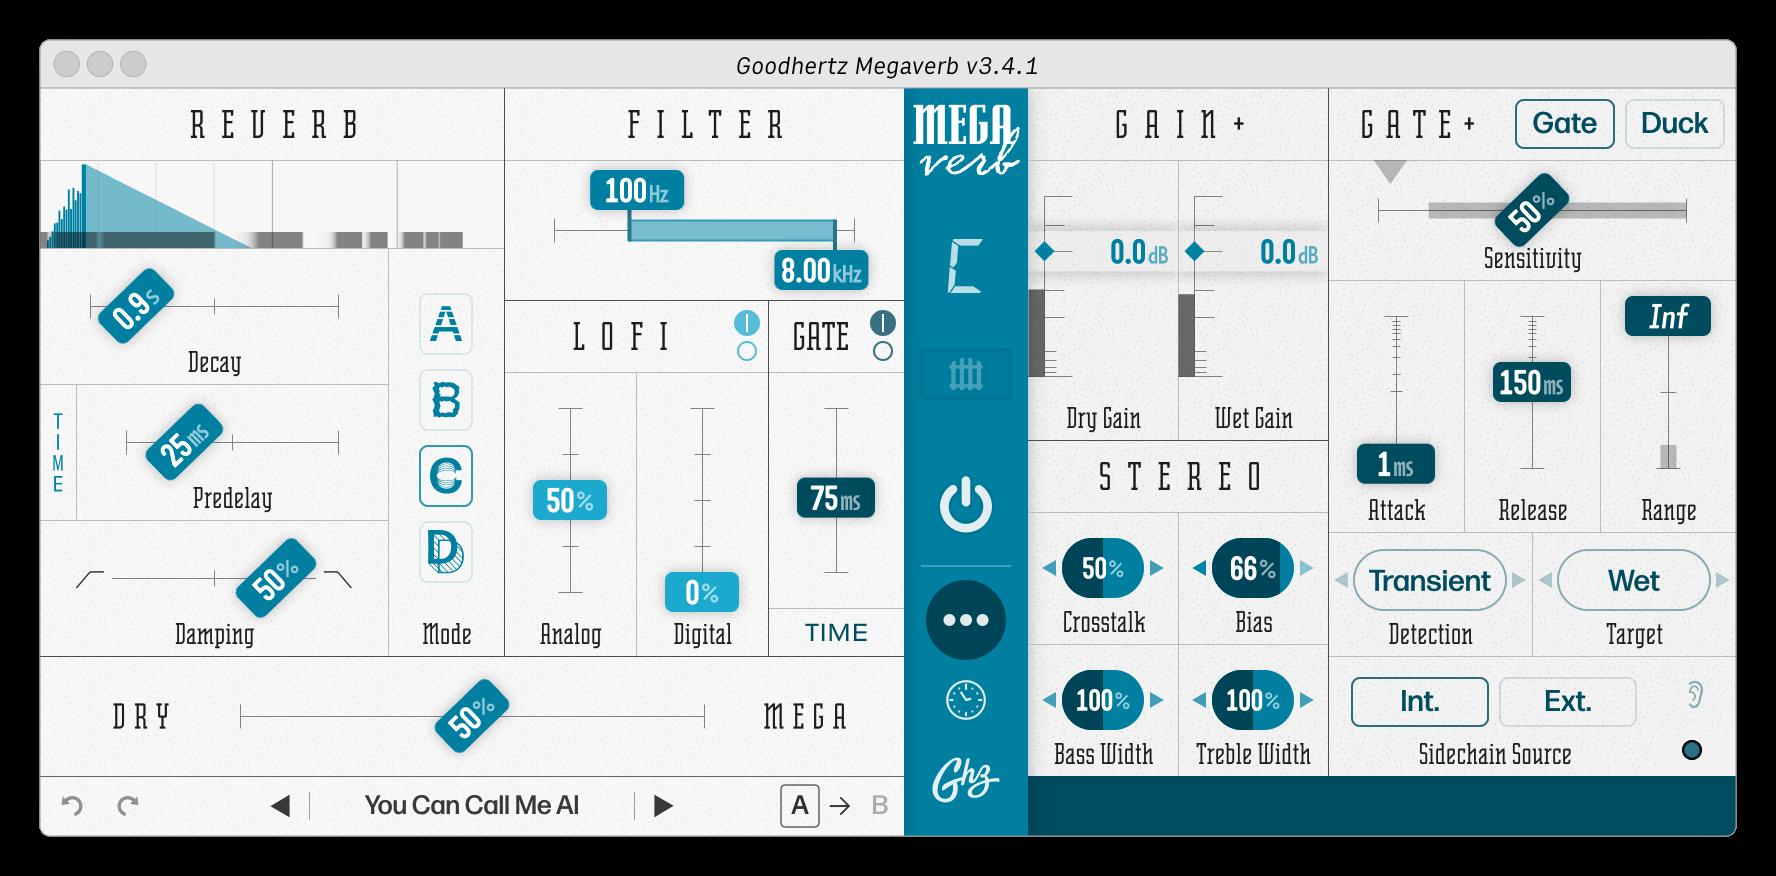 Goodhertz launches 3 4 1 update including new Megaverb plugin